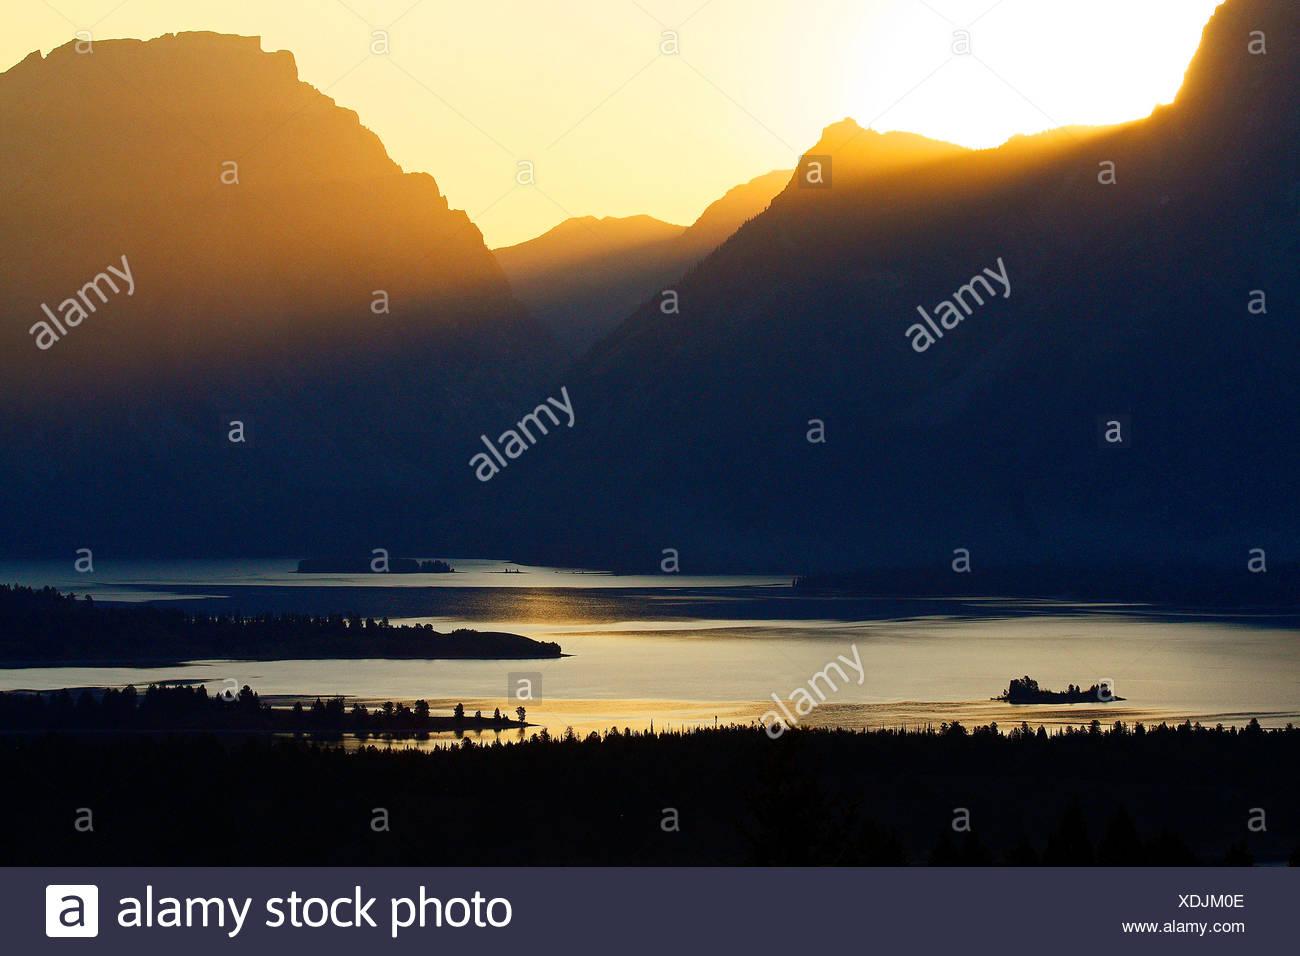 A setting sun shines over Jackson Lake and the Grand Tetons at Grand Teton National Park, Wyoming - Stock Image